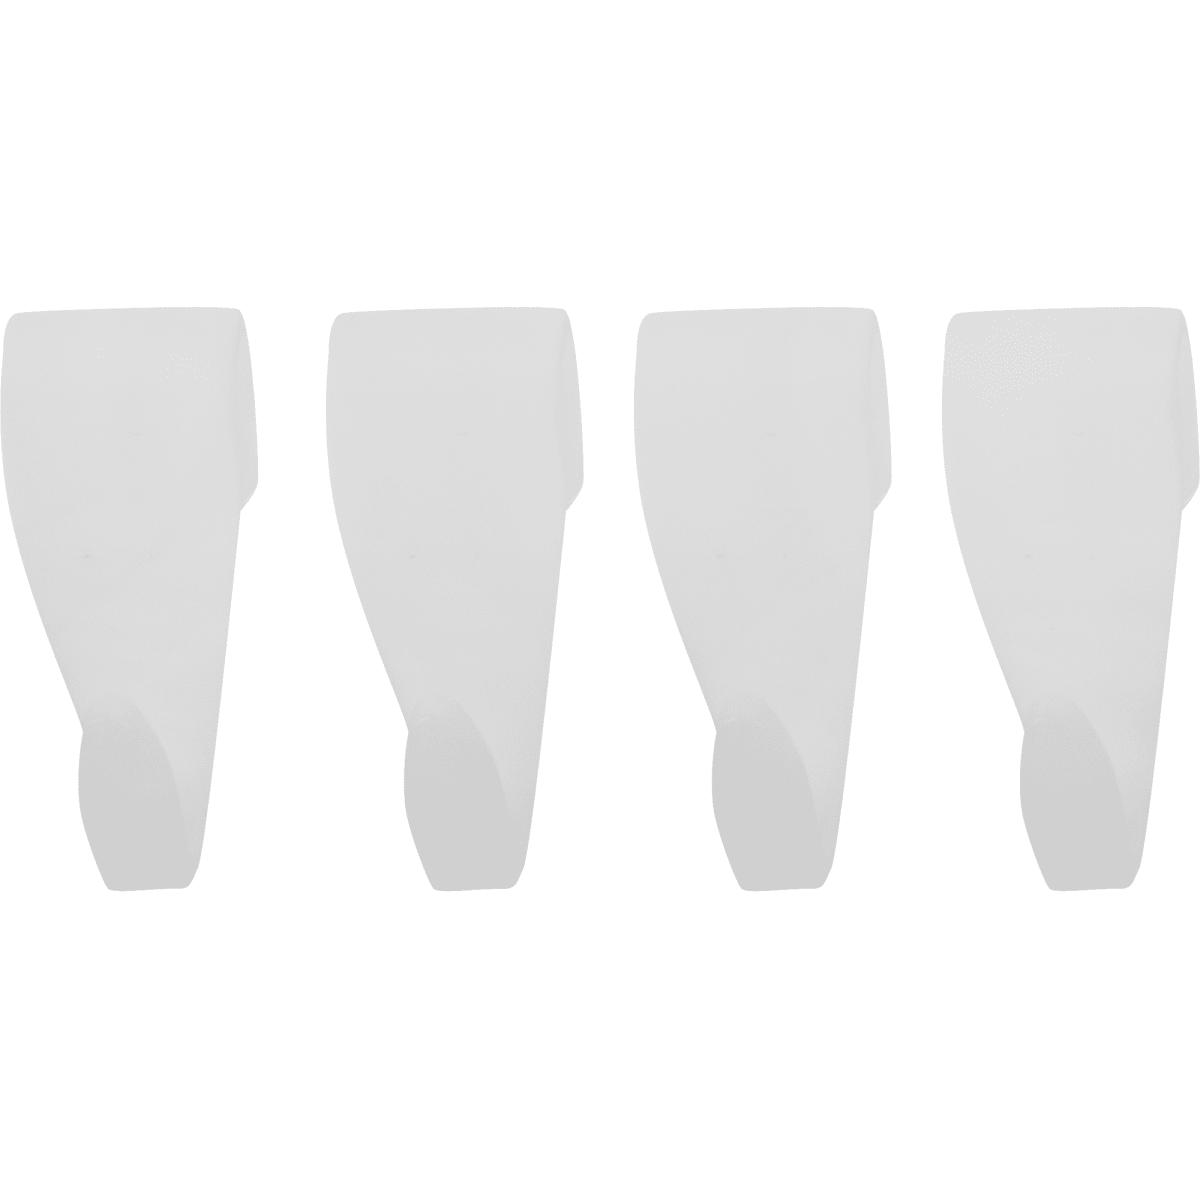 Набор крючков, пластик, цвет белый, 4 шт.